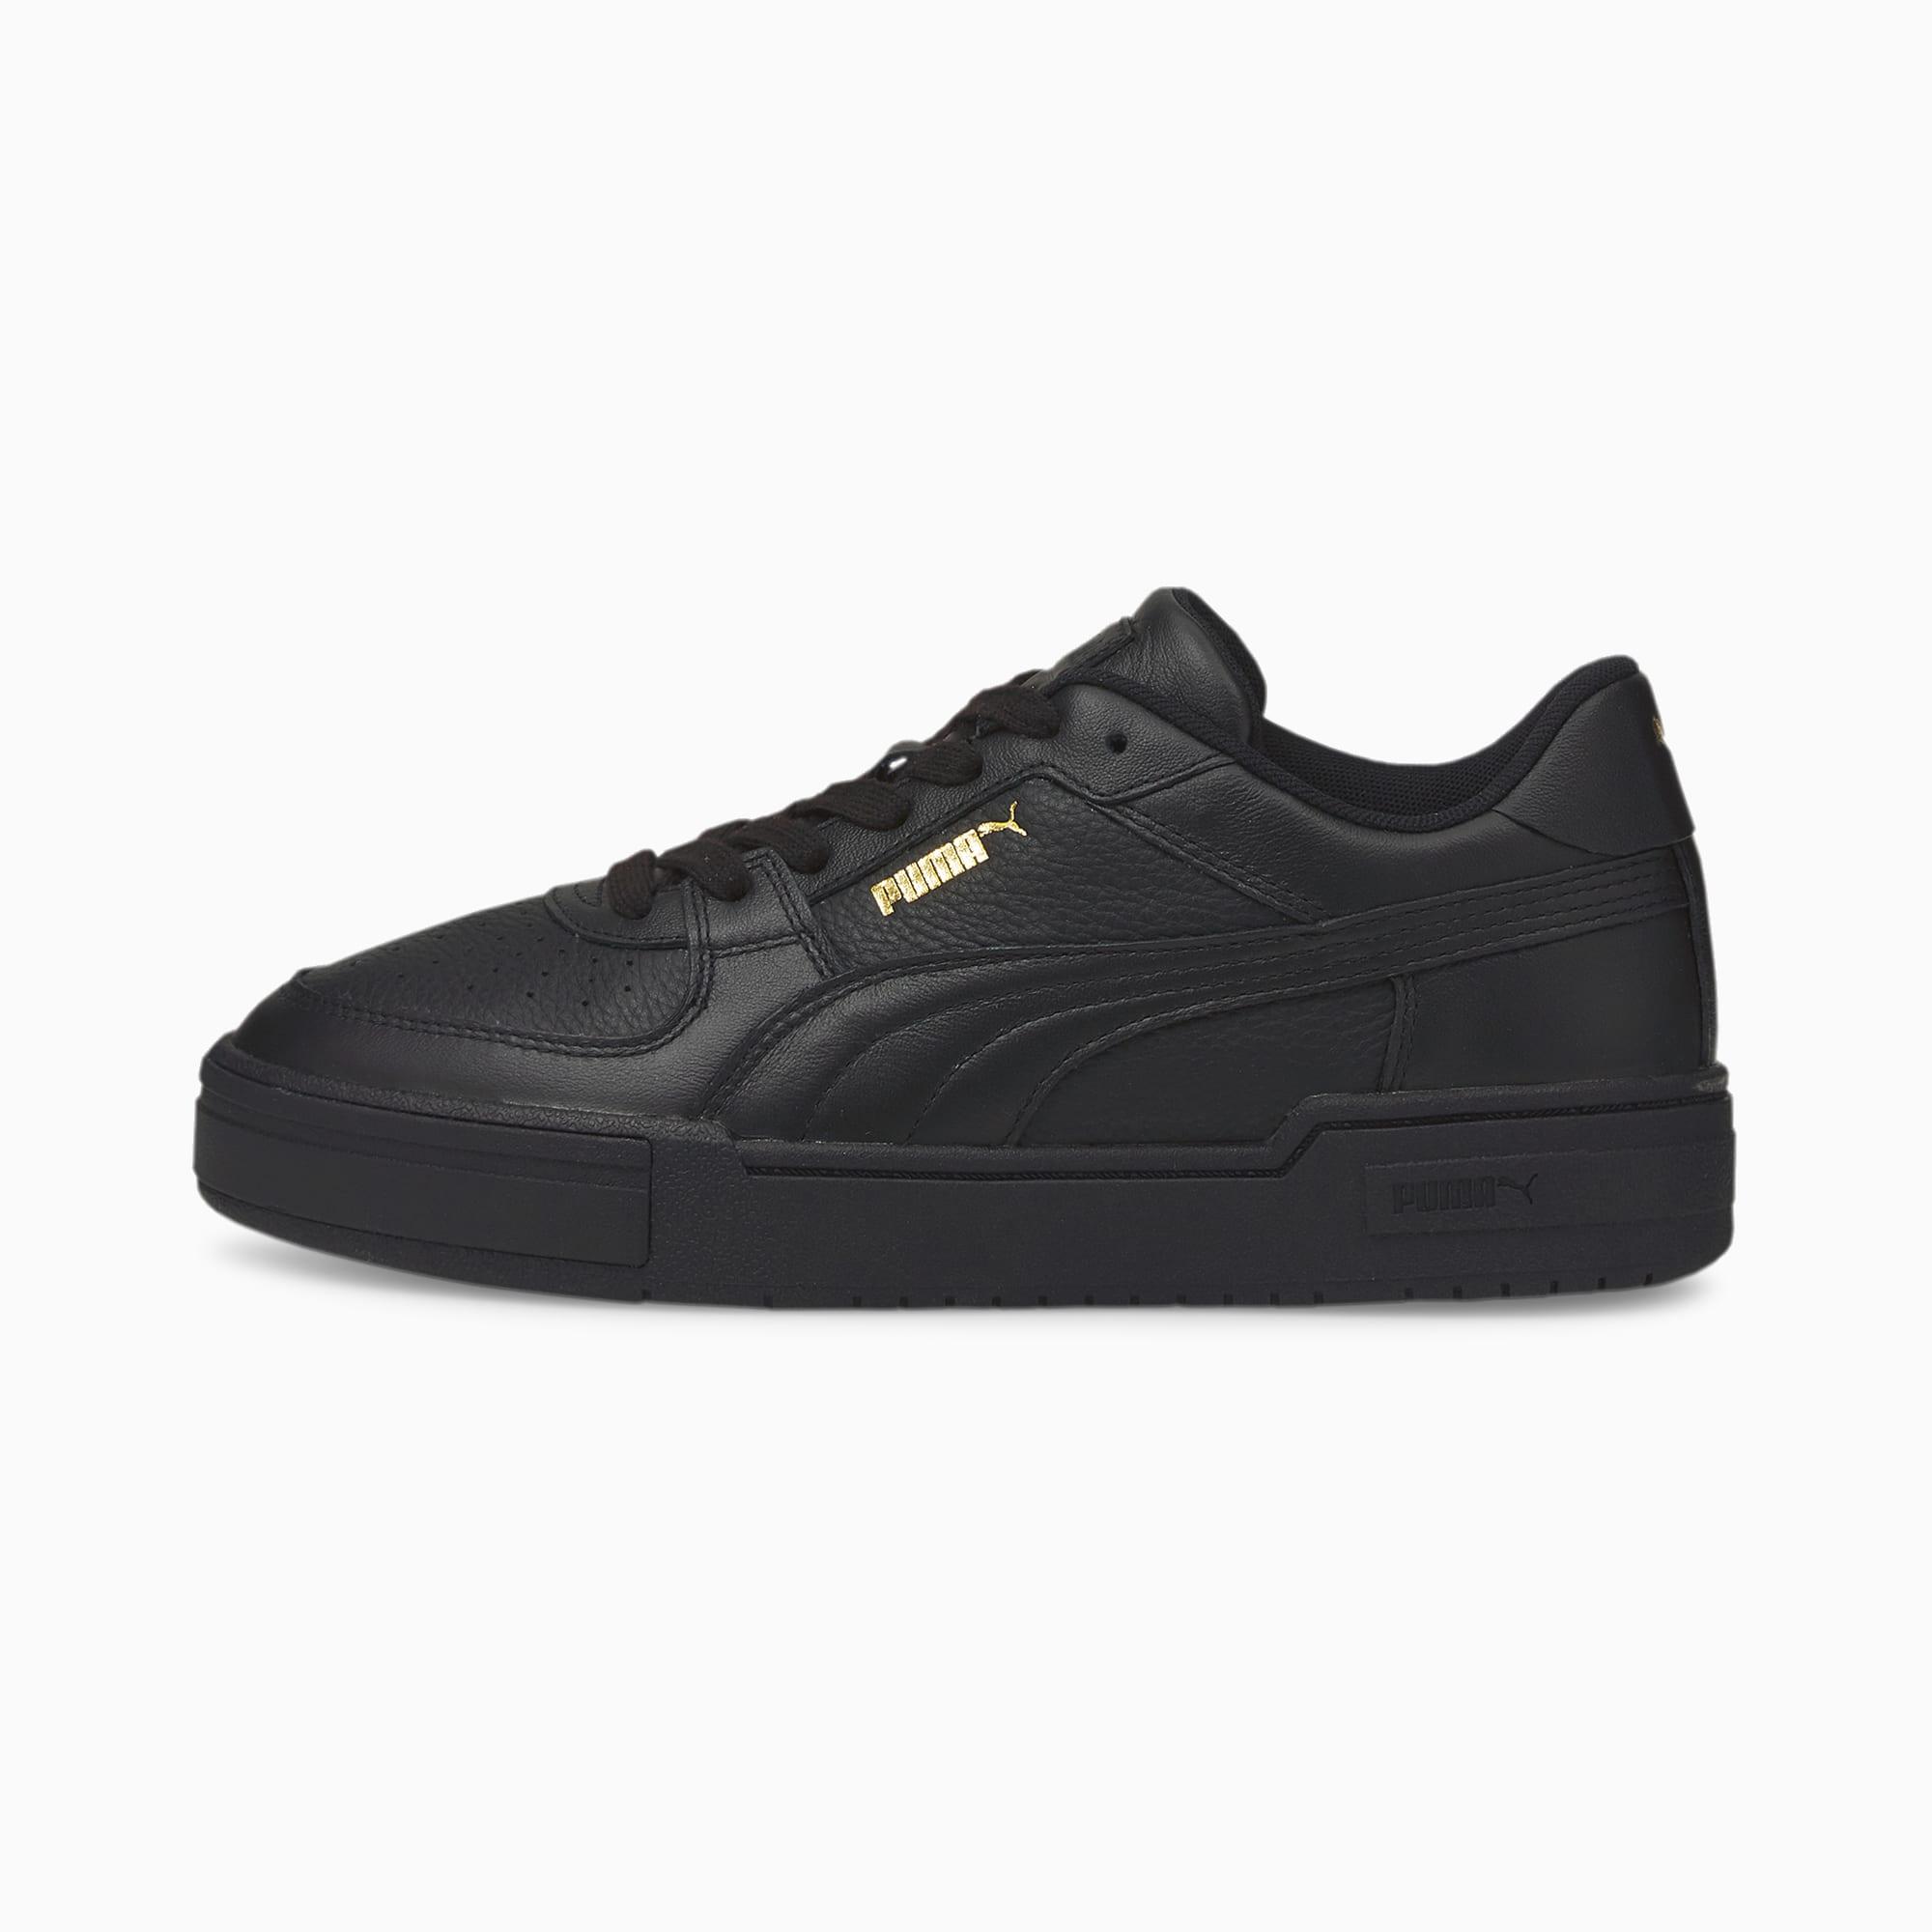 CA Pro Classic sneakers, Zwart, Maat 48,5 | PUMA